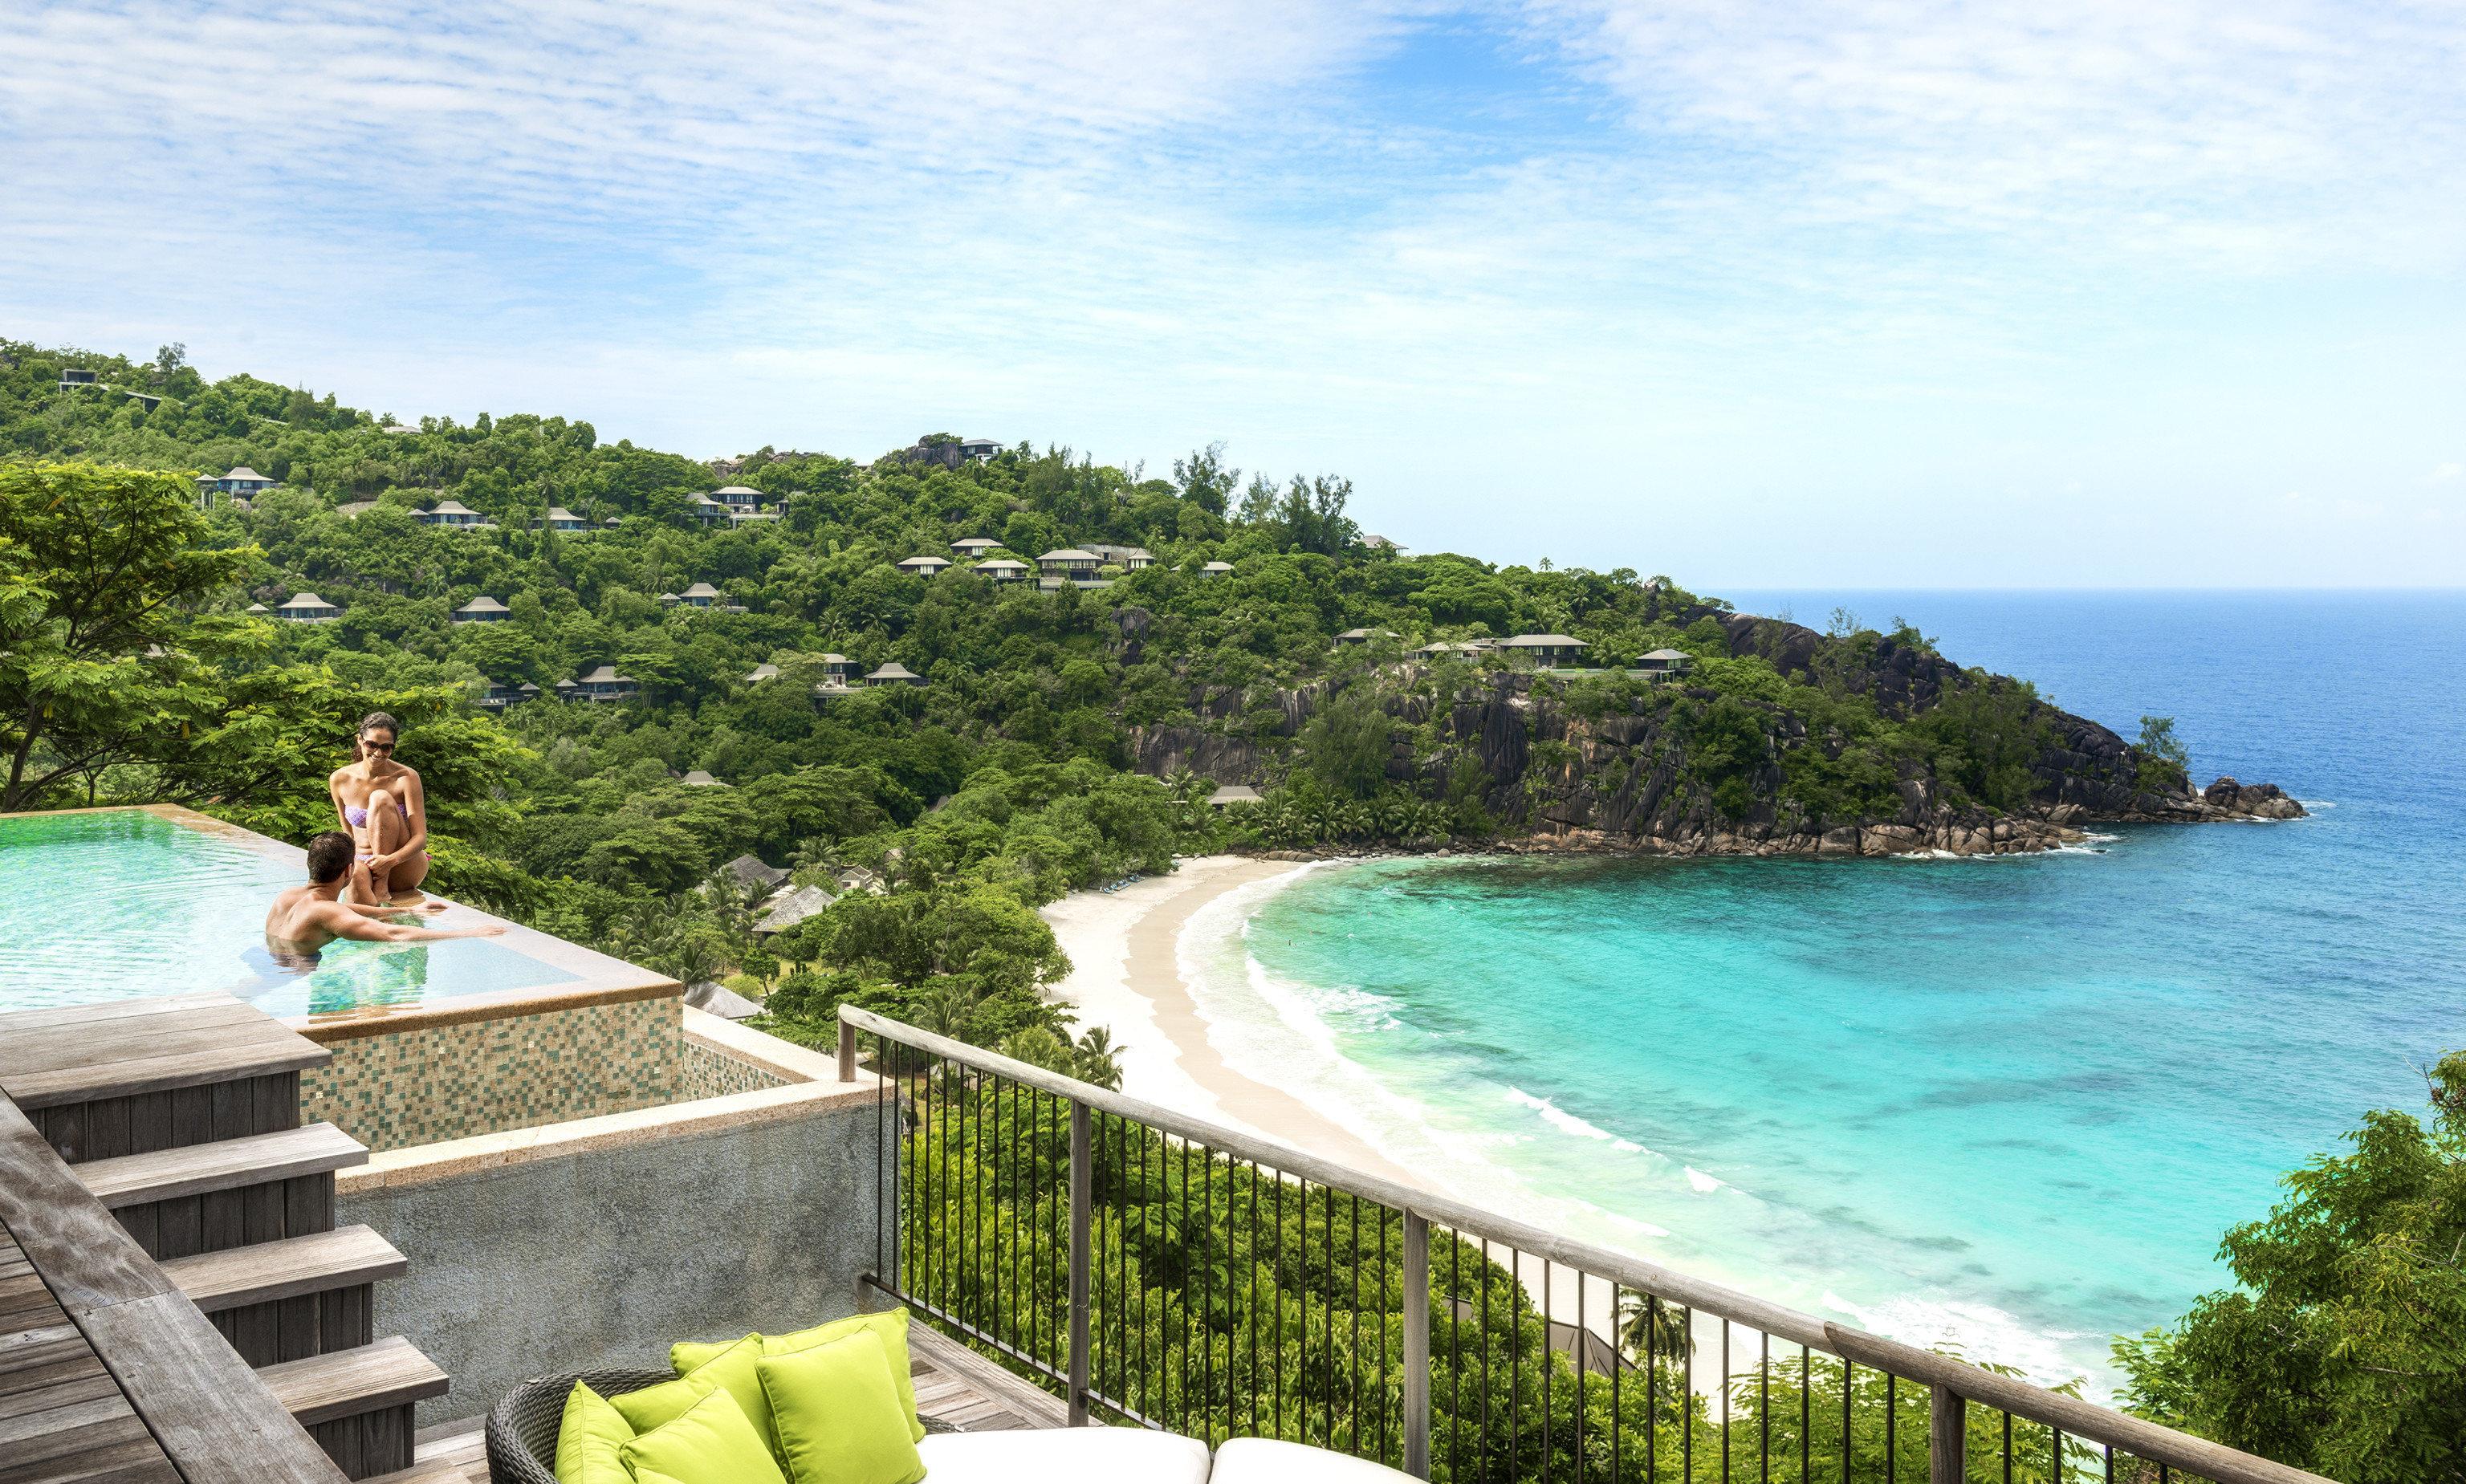 water sky Sea Coast Beach caribbean Ocean Nature Resort cove tropics Island cape Lagoon terrain overlooking shore